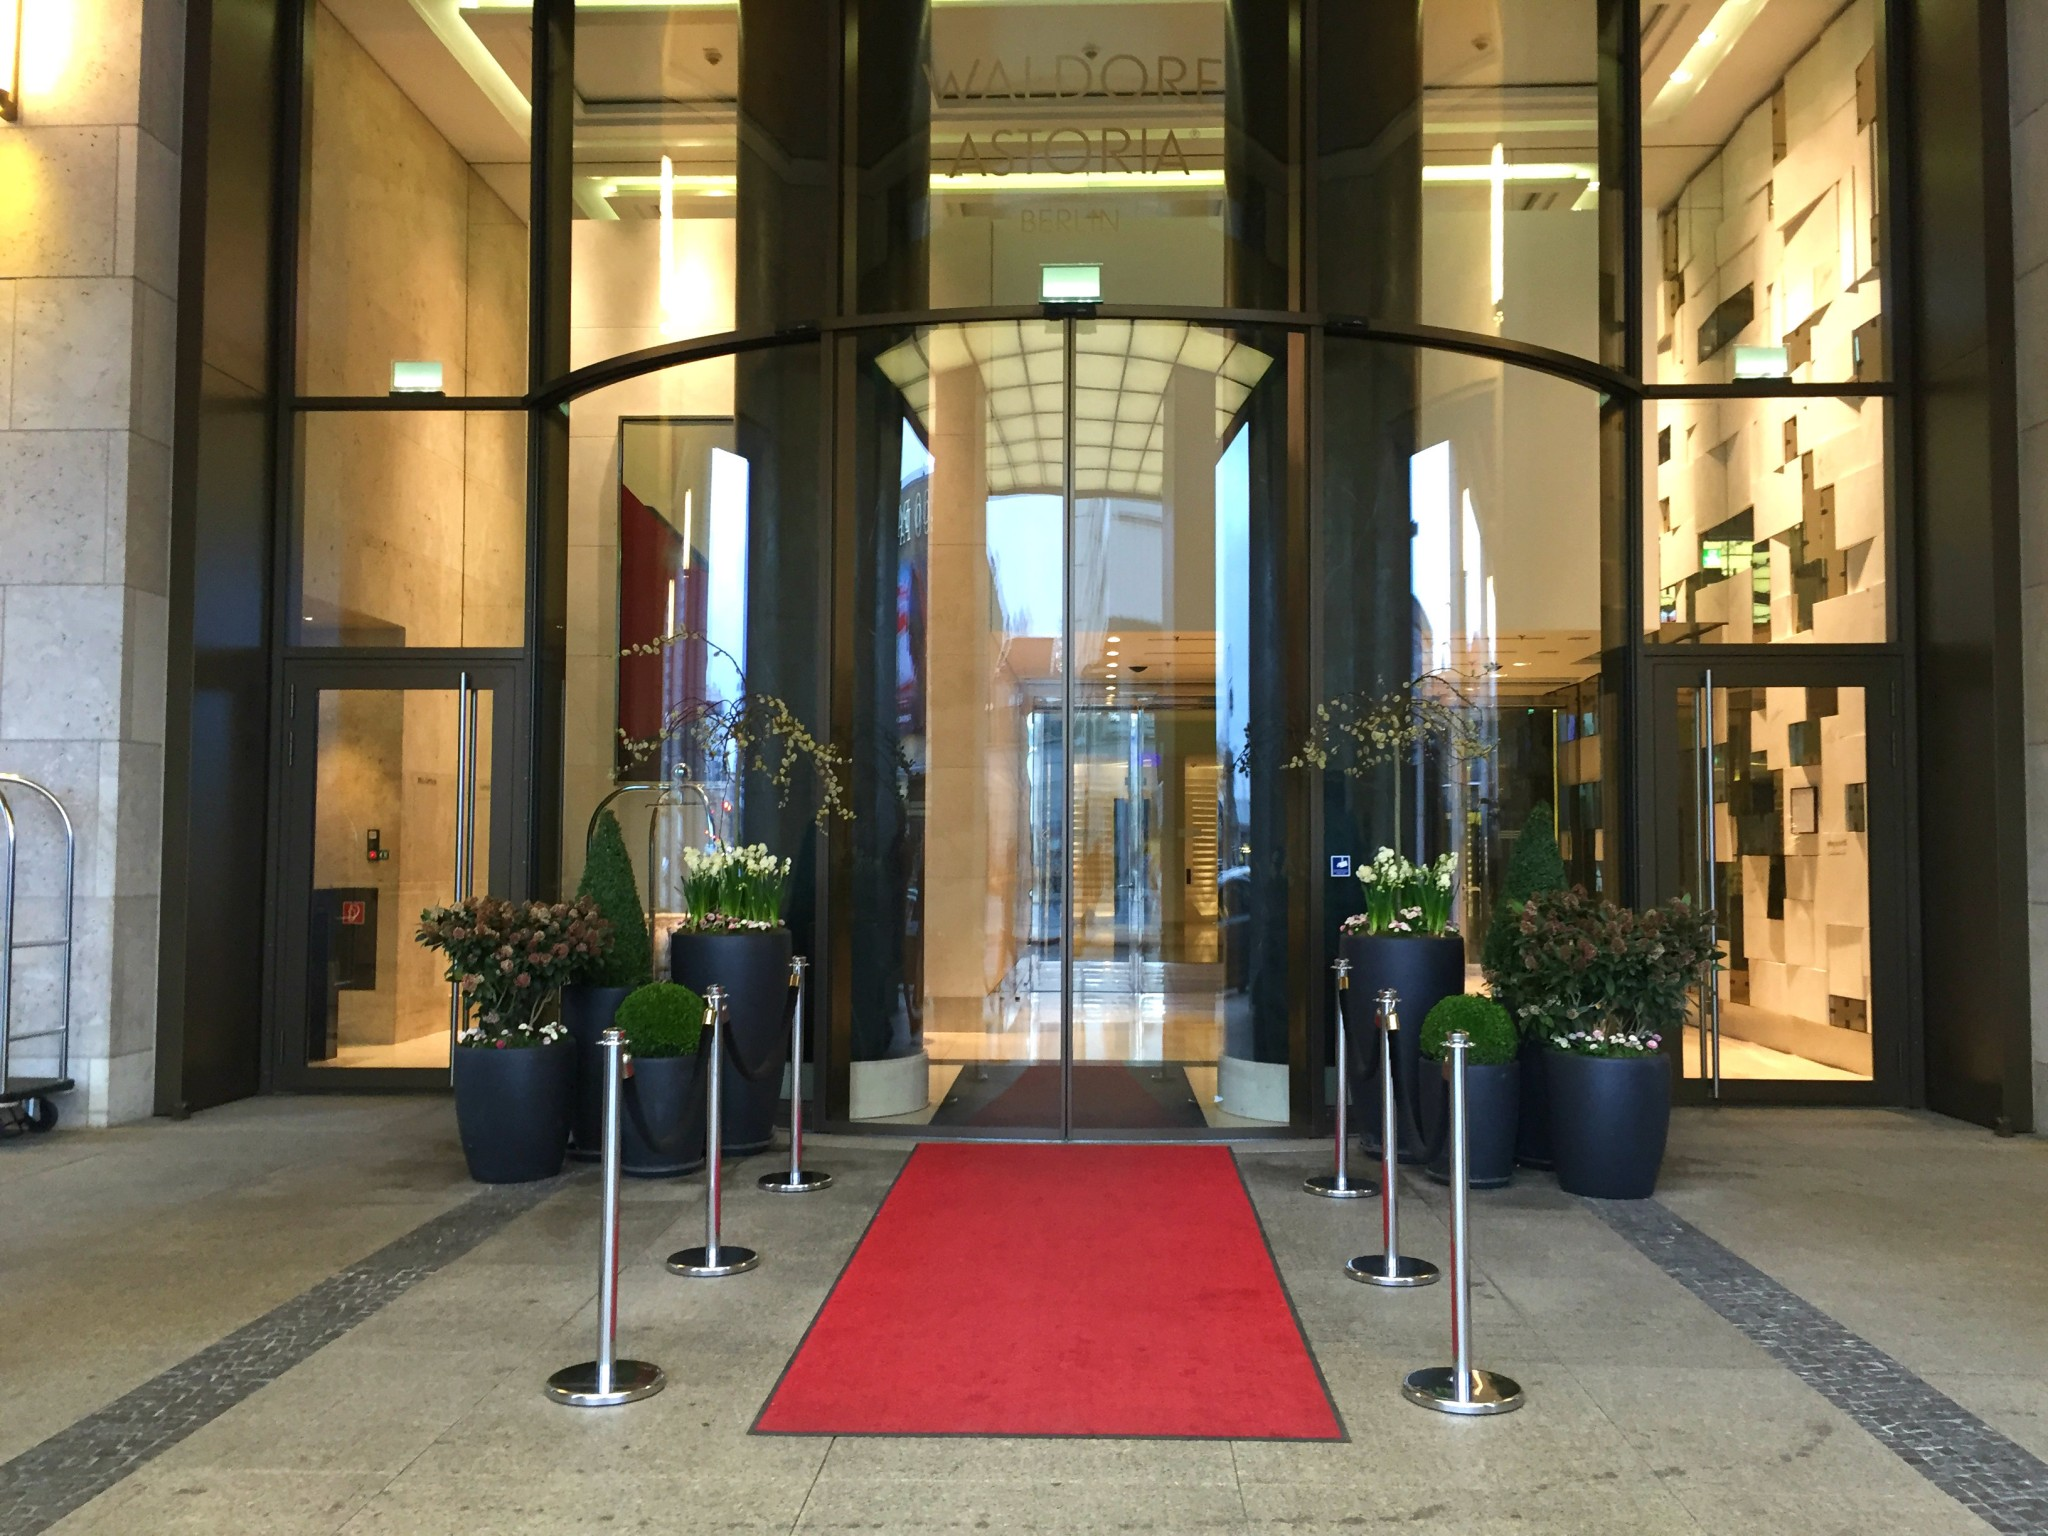 Waldorf Astoria Berlin etuovi